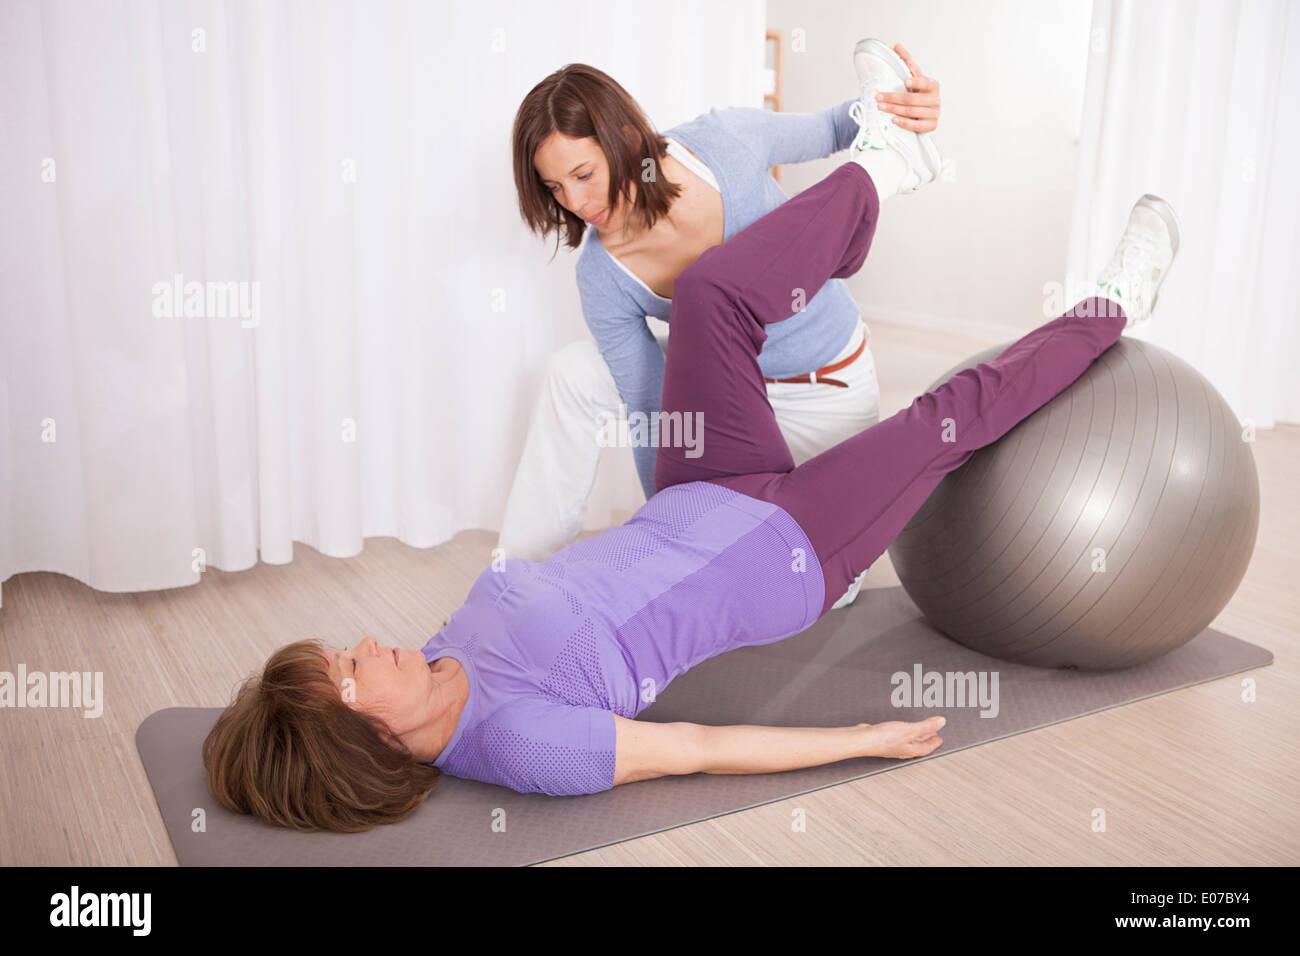 Senior woman adjusting woman's hip on exercise ball - Stock Image